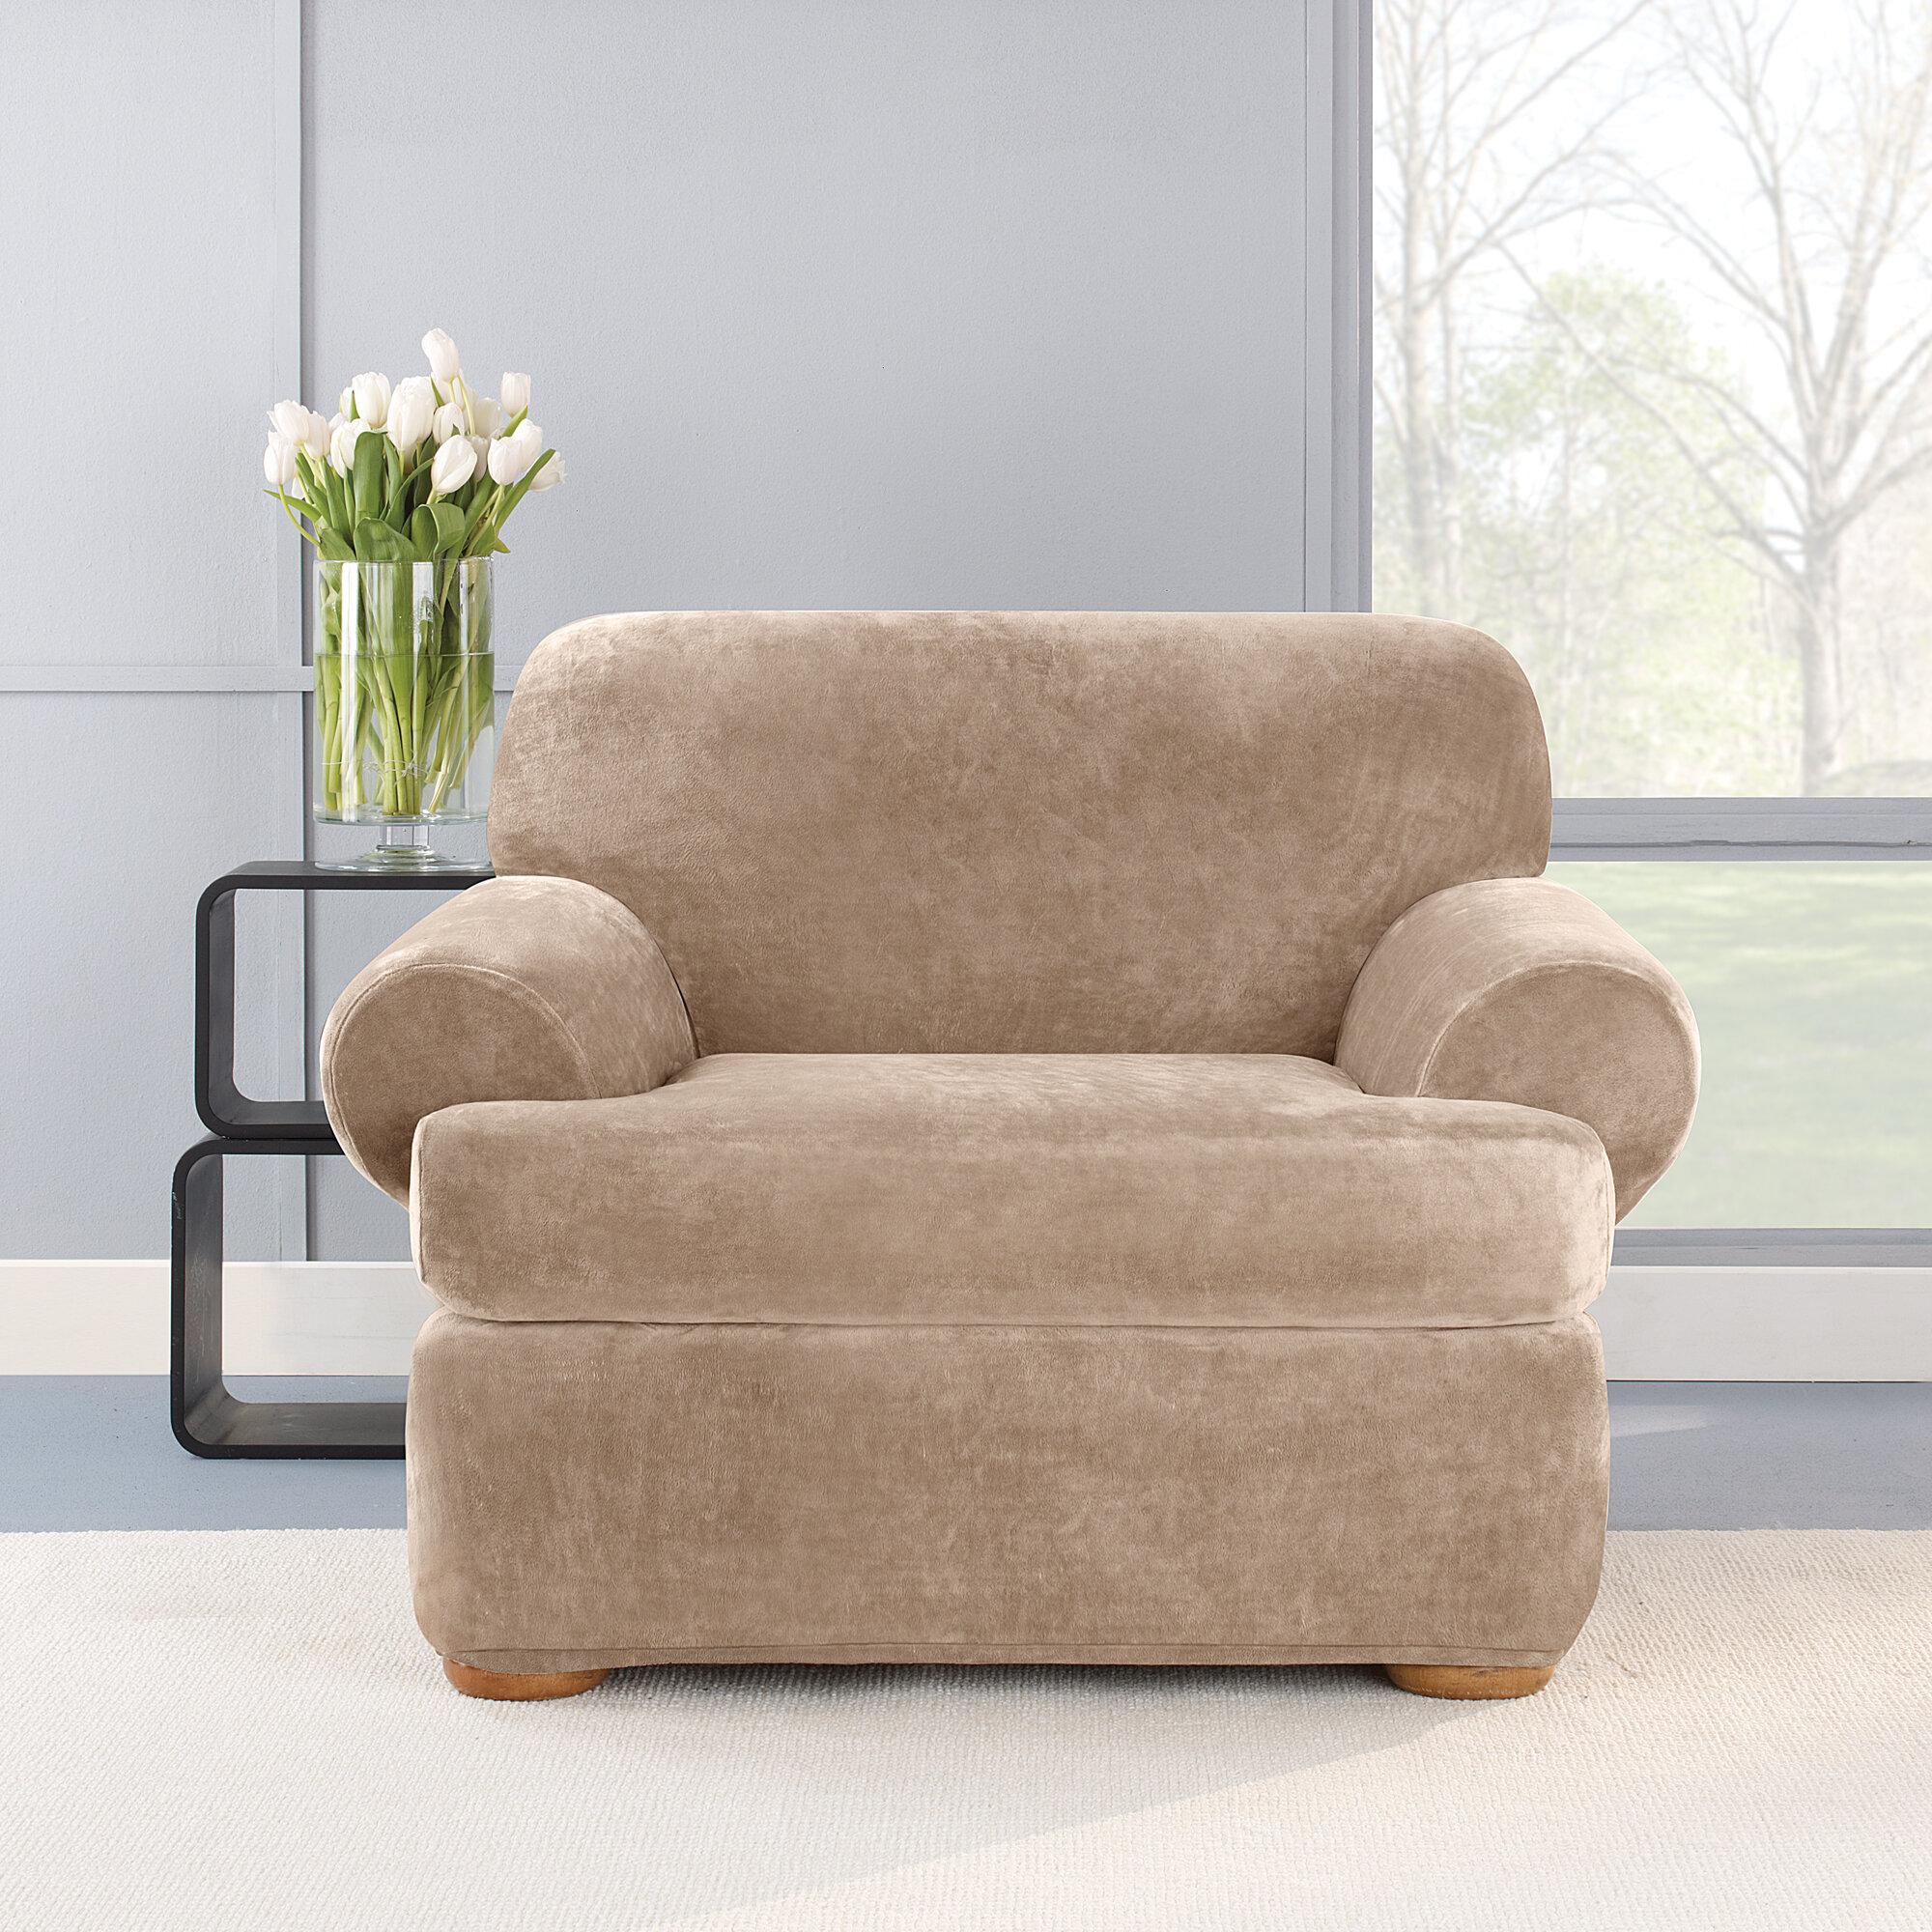 Stretch Plush 2 Piece T-Cushion Chair Slipcover Set